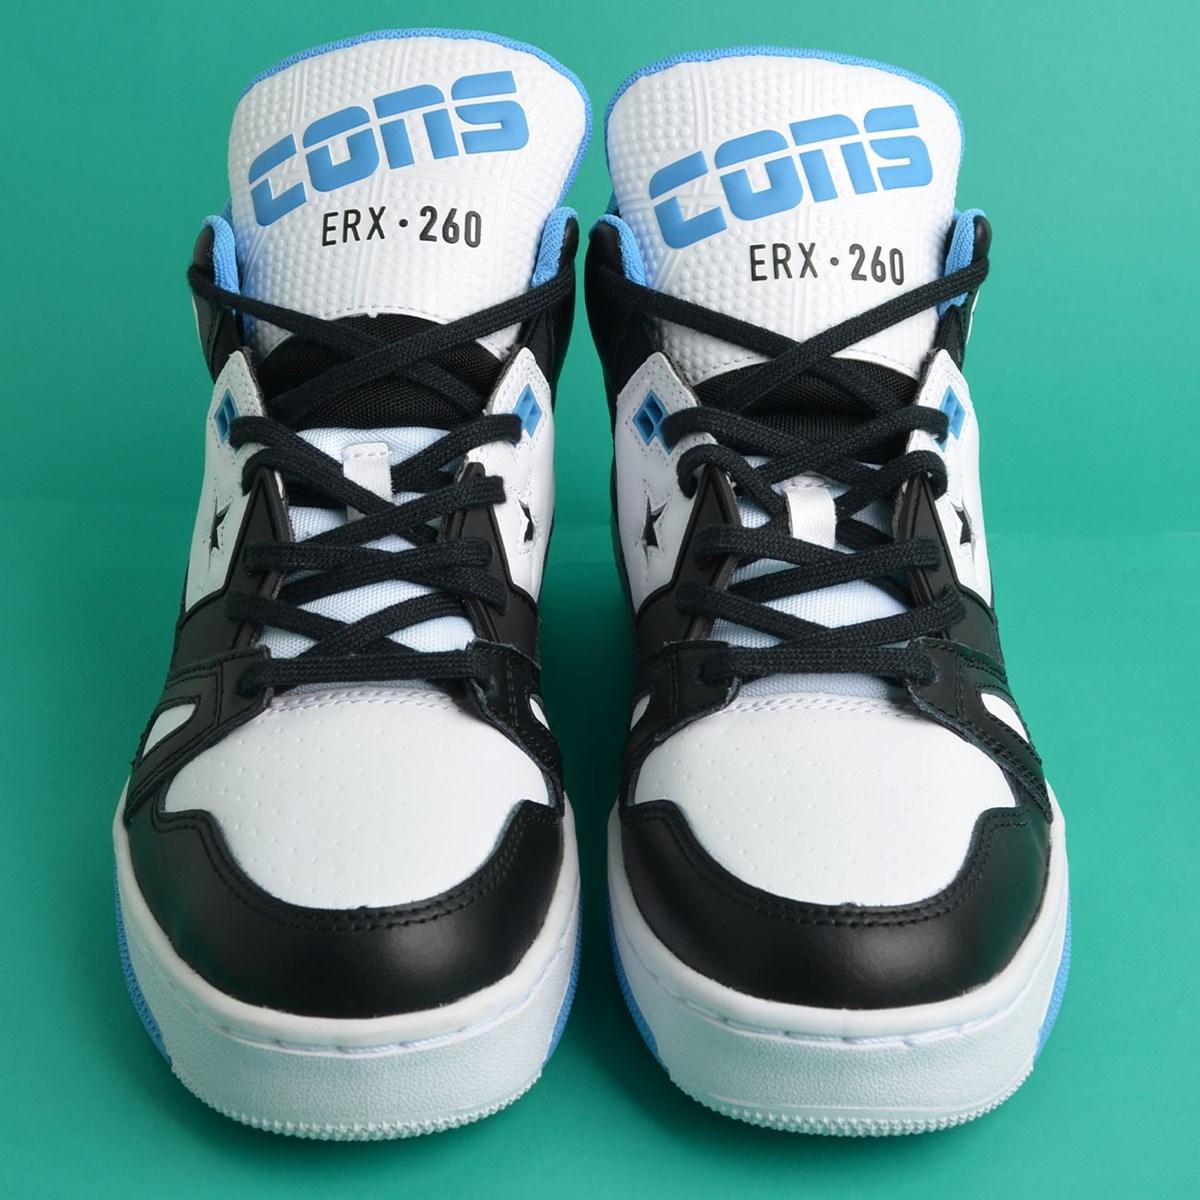 Tênis Converse ERX 260 Mid Black Coast White 167111C